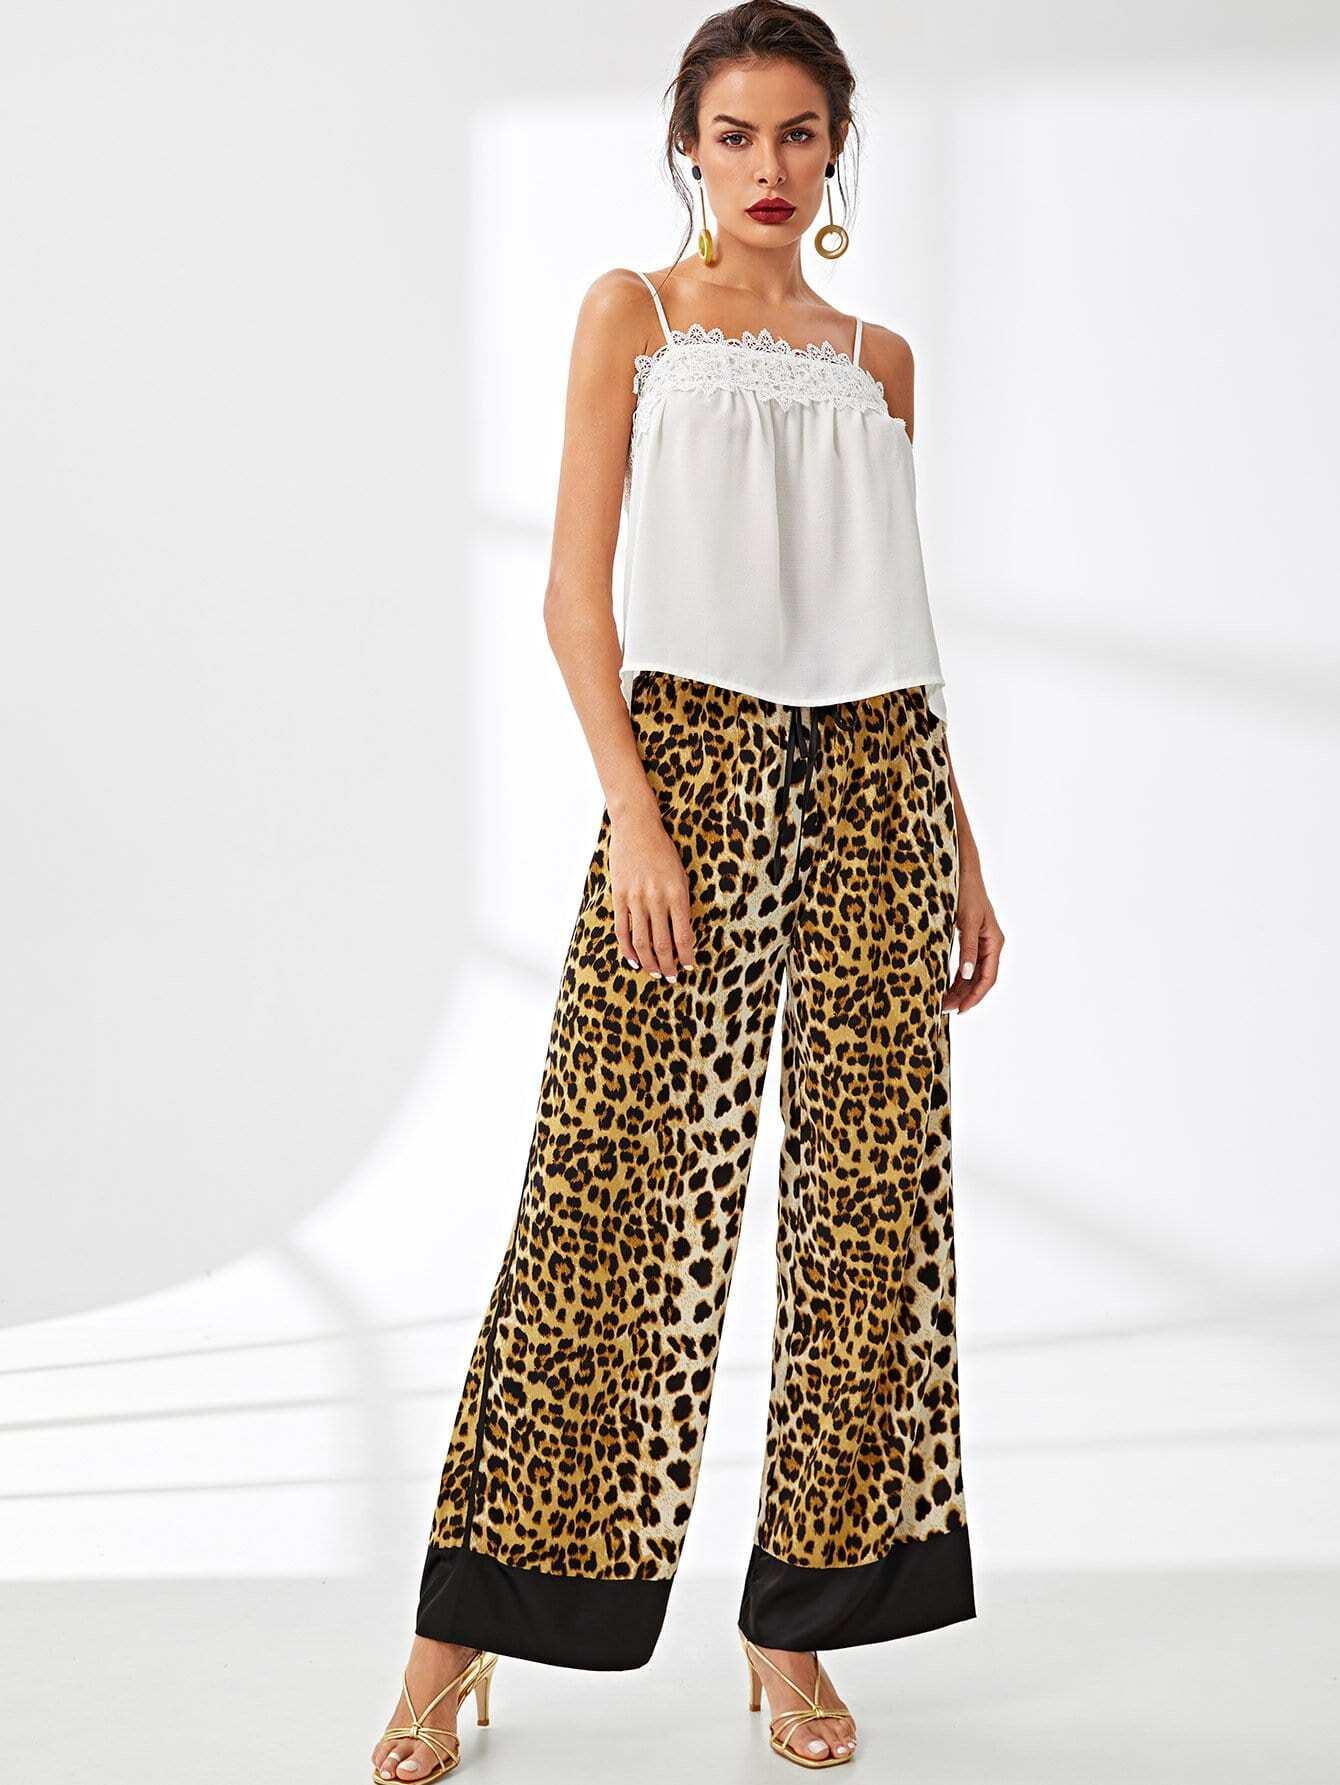 Waist Drawstring Leopard Print Pants morgan mg 006s 1ba